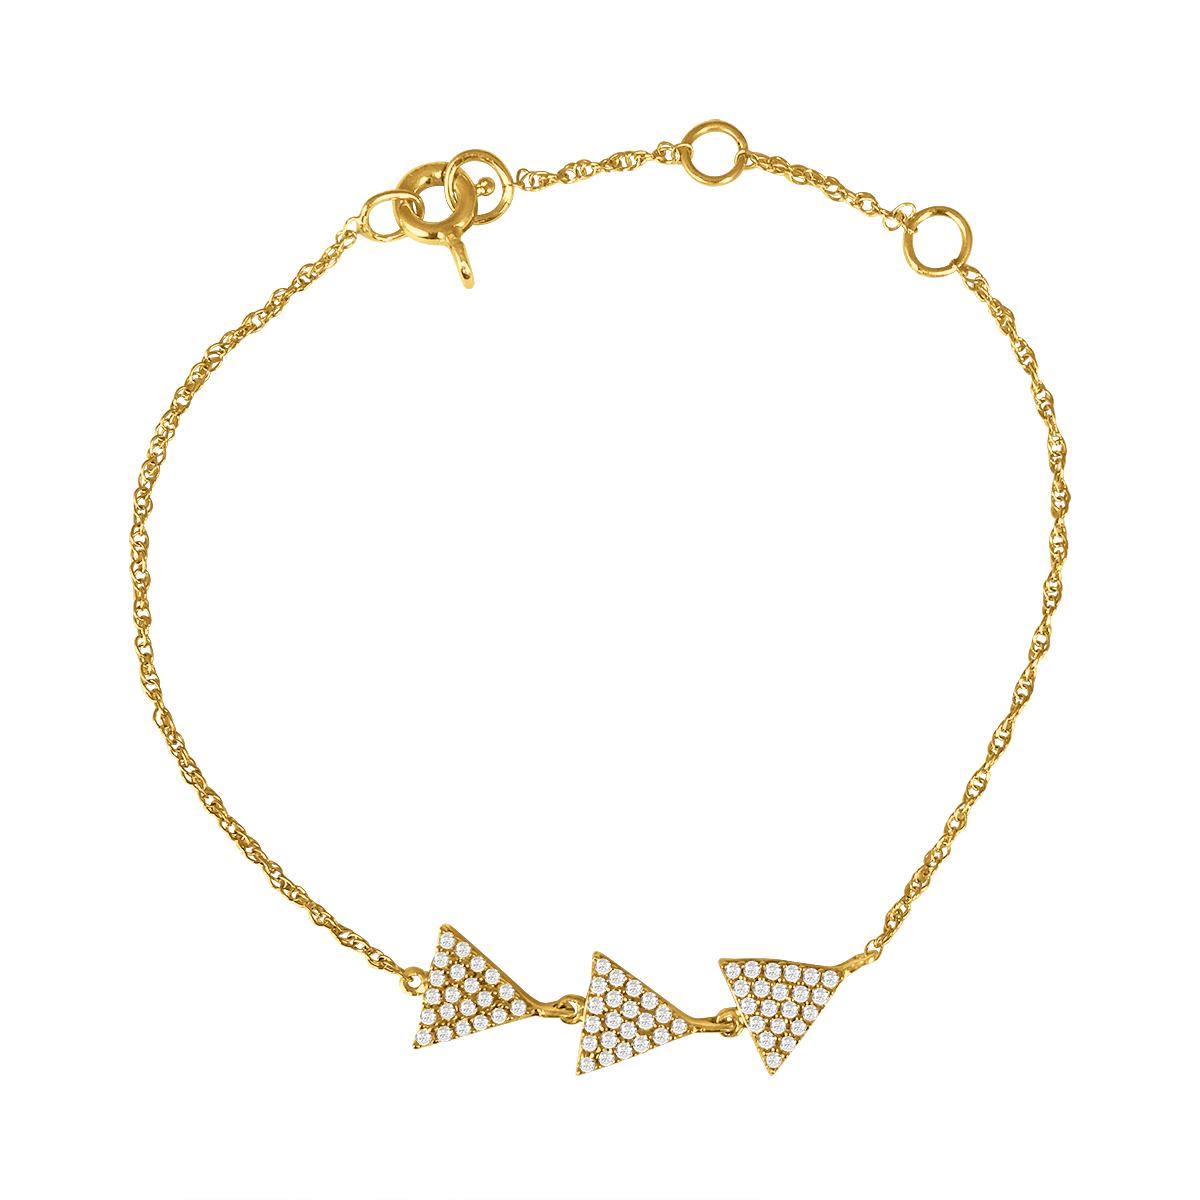 1/3 Carat TW Triple Arrow Diamond Chain Bracelet in 10K Yellow Gold